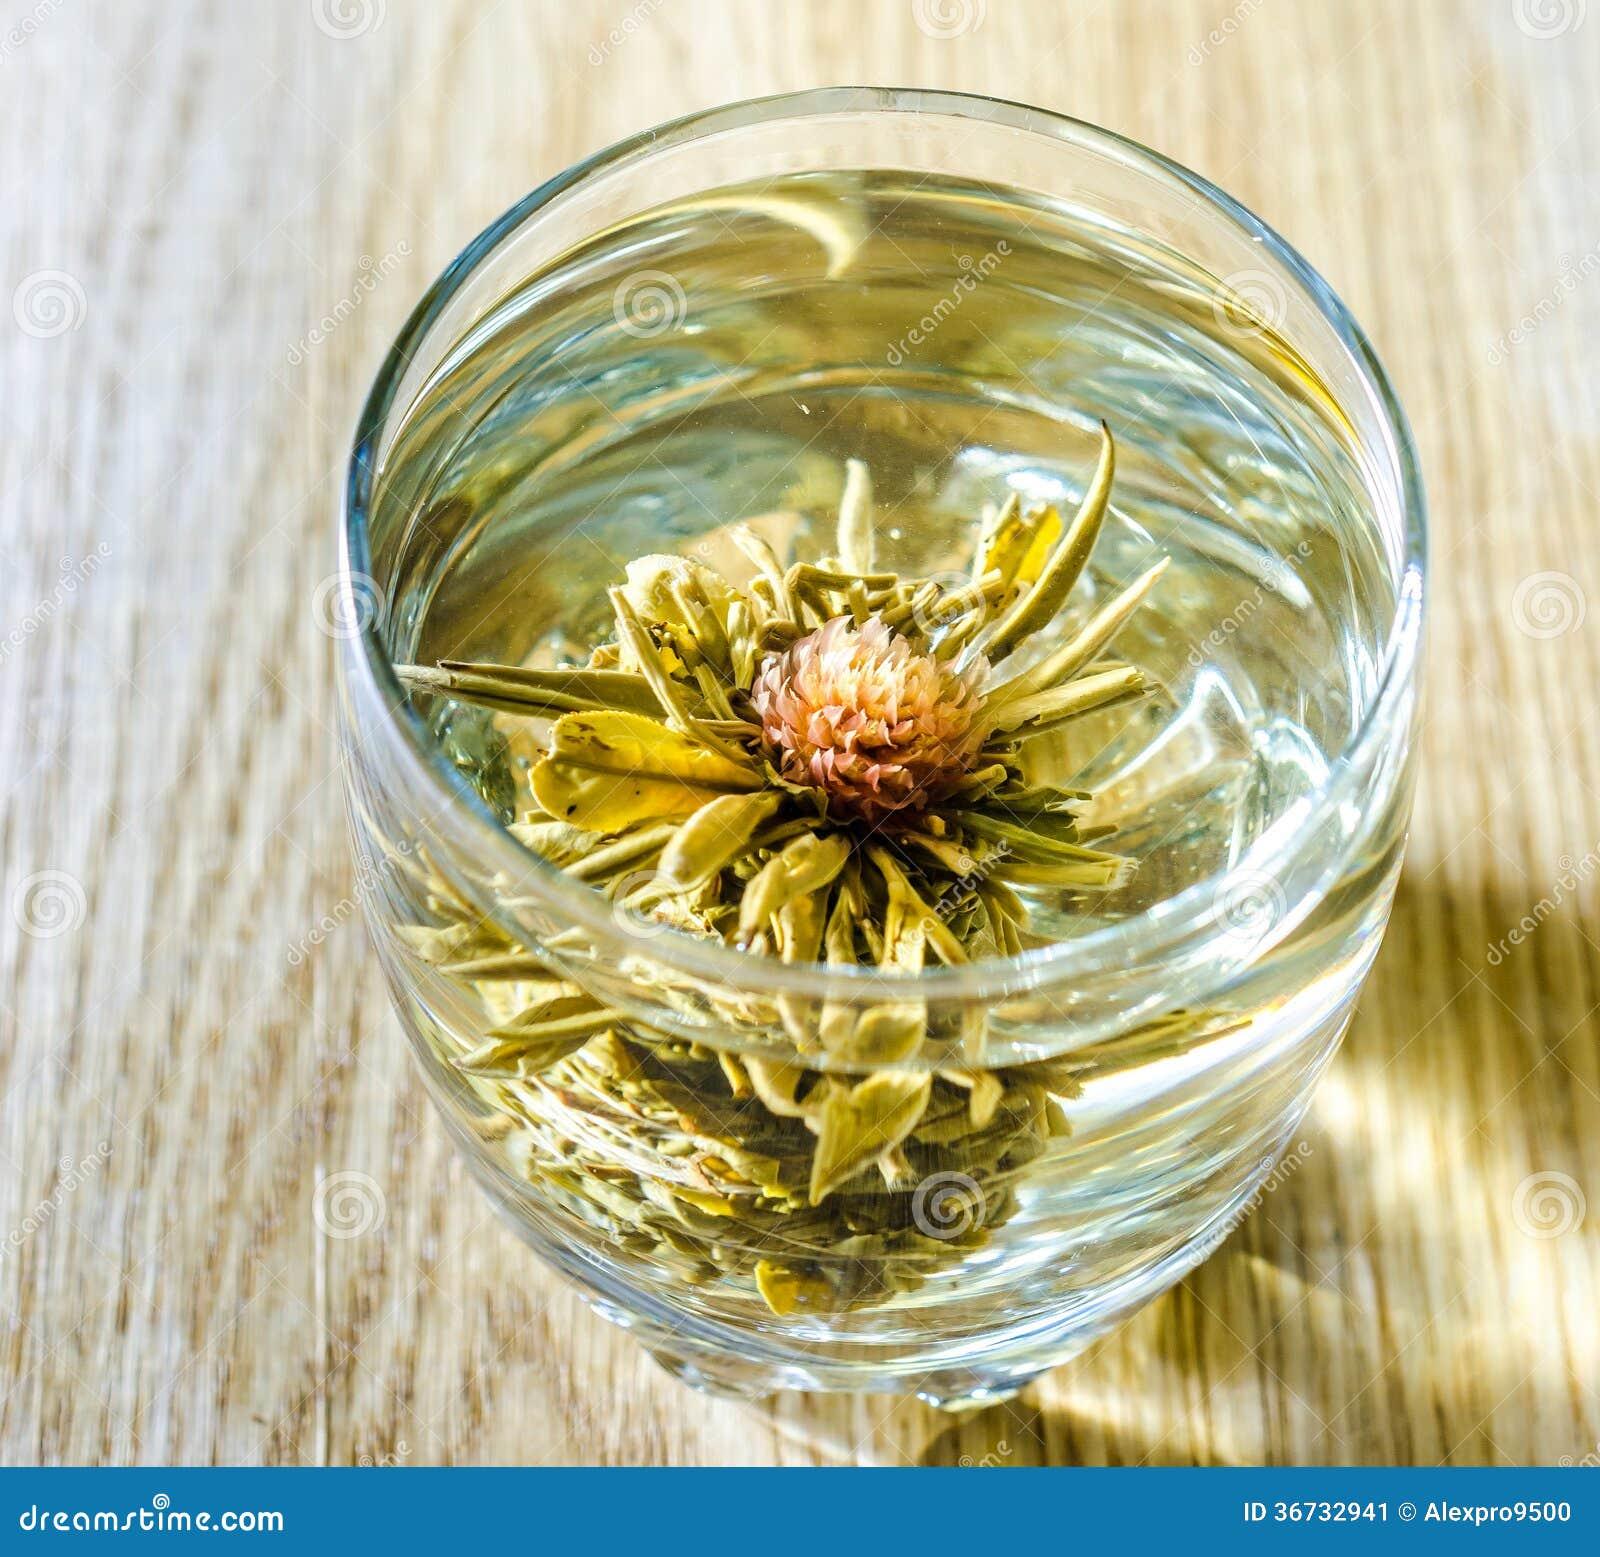 Lotus flower tea stock image image of drink background 36732941 download lotus flower tea stock image image of drink background 36732941 izmirmasajfo